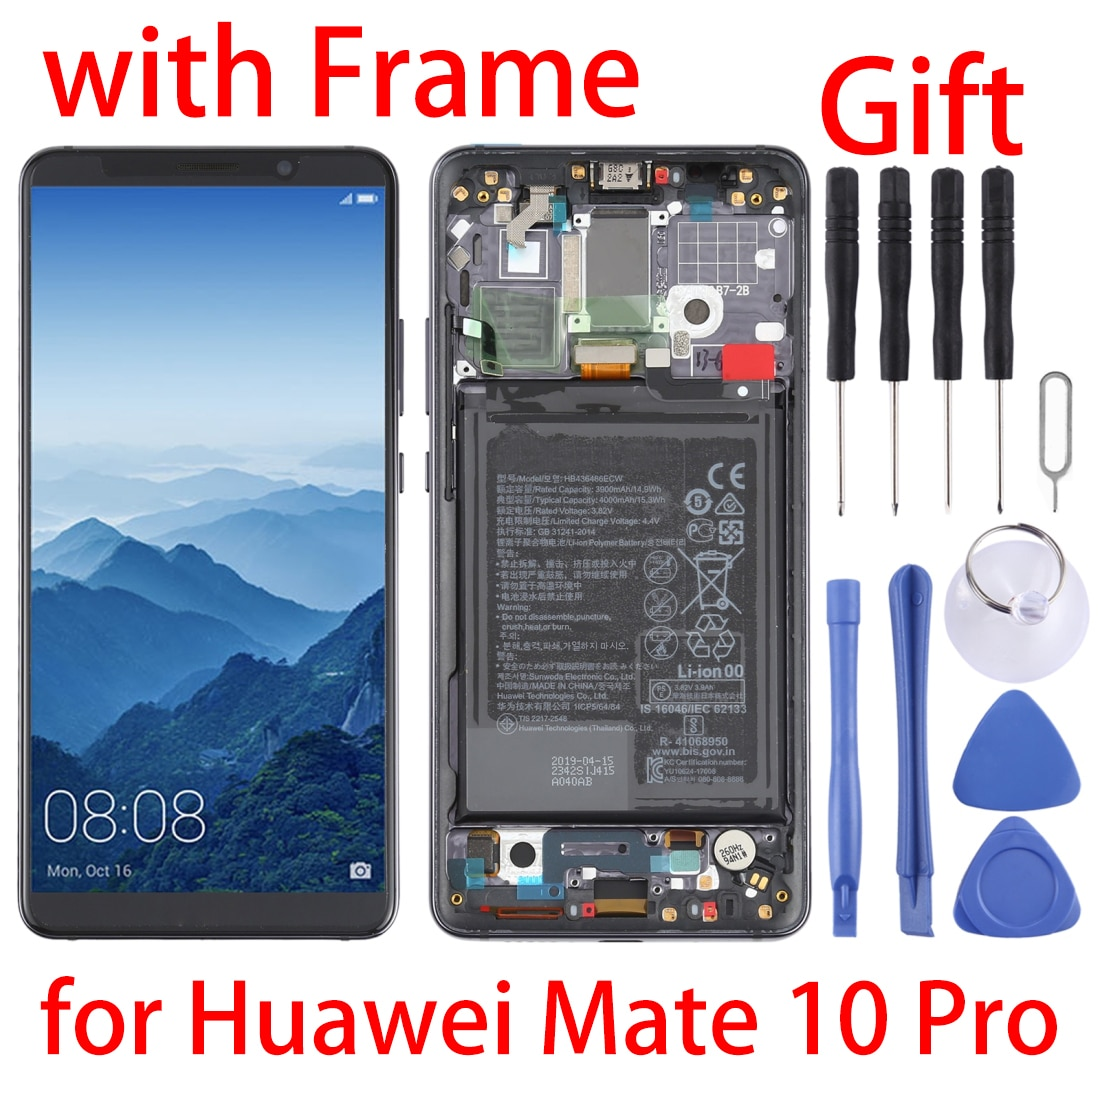 جديد لشاشة Mate 10 Pro LCD ومحول رقمي تجميع كامل مع إطار لهاتف Huawei Mate 10 Pro